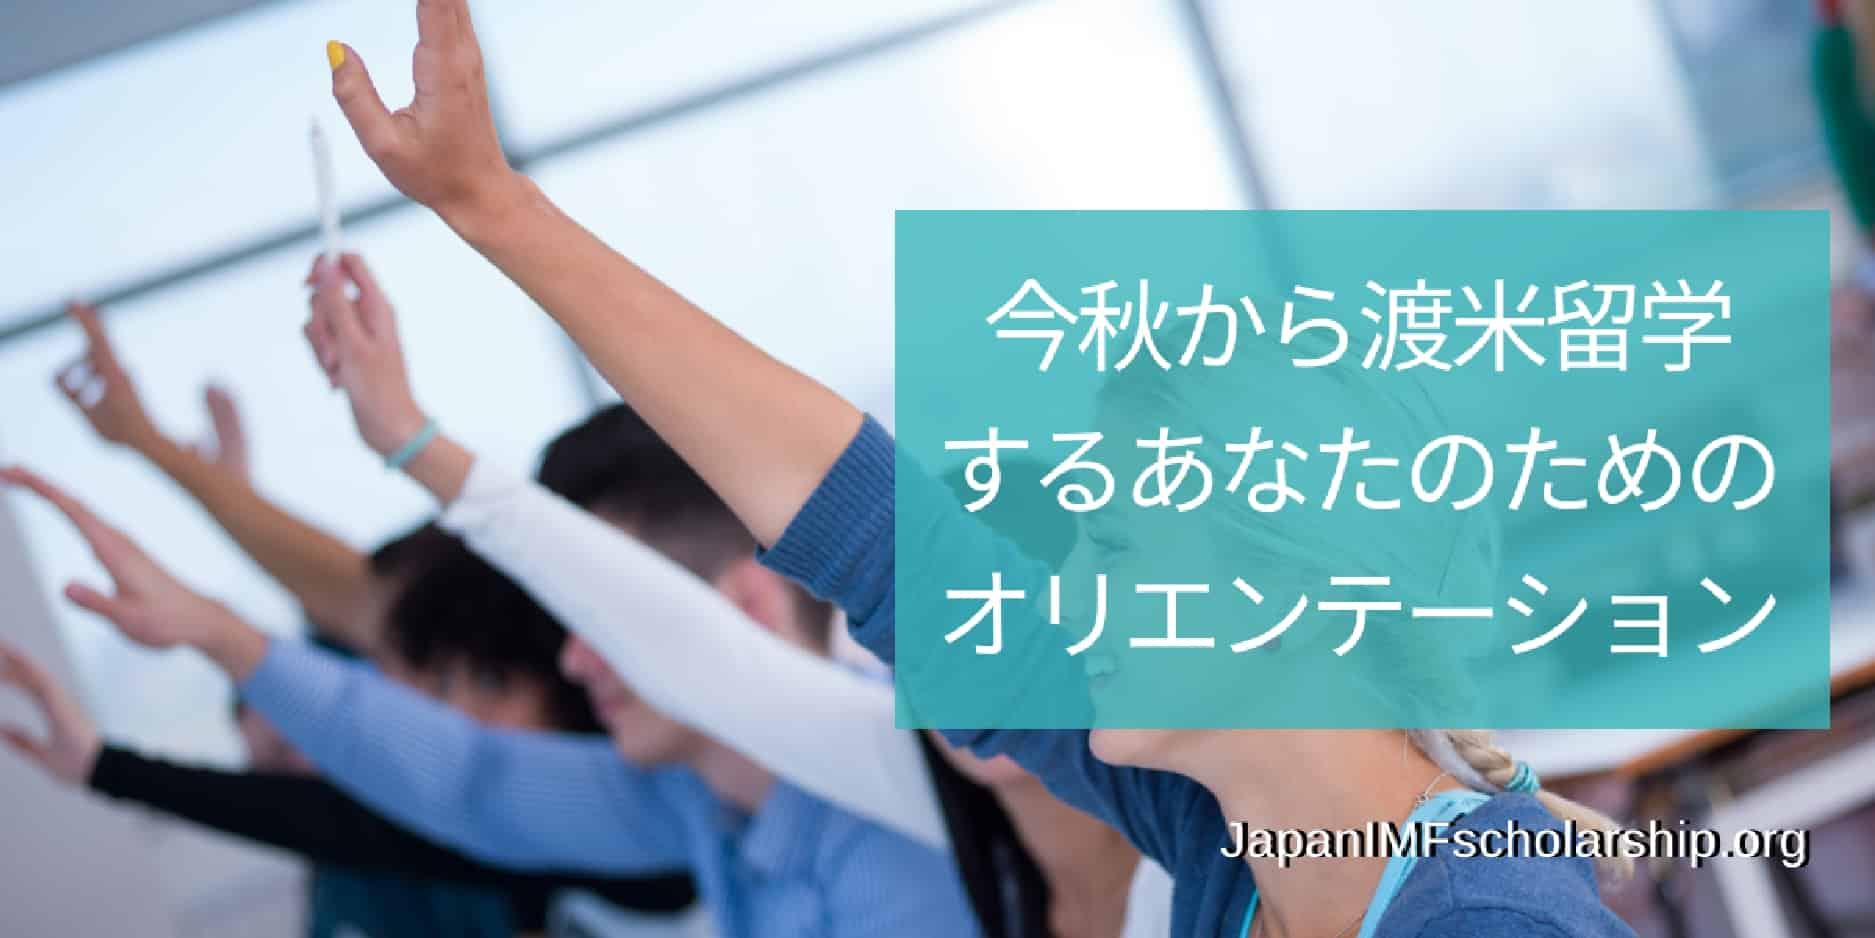 jisp web-fb orientation by fulbright | visit japanimfscholarship.org